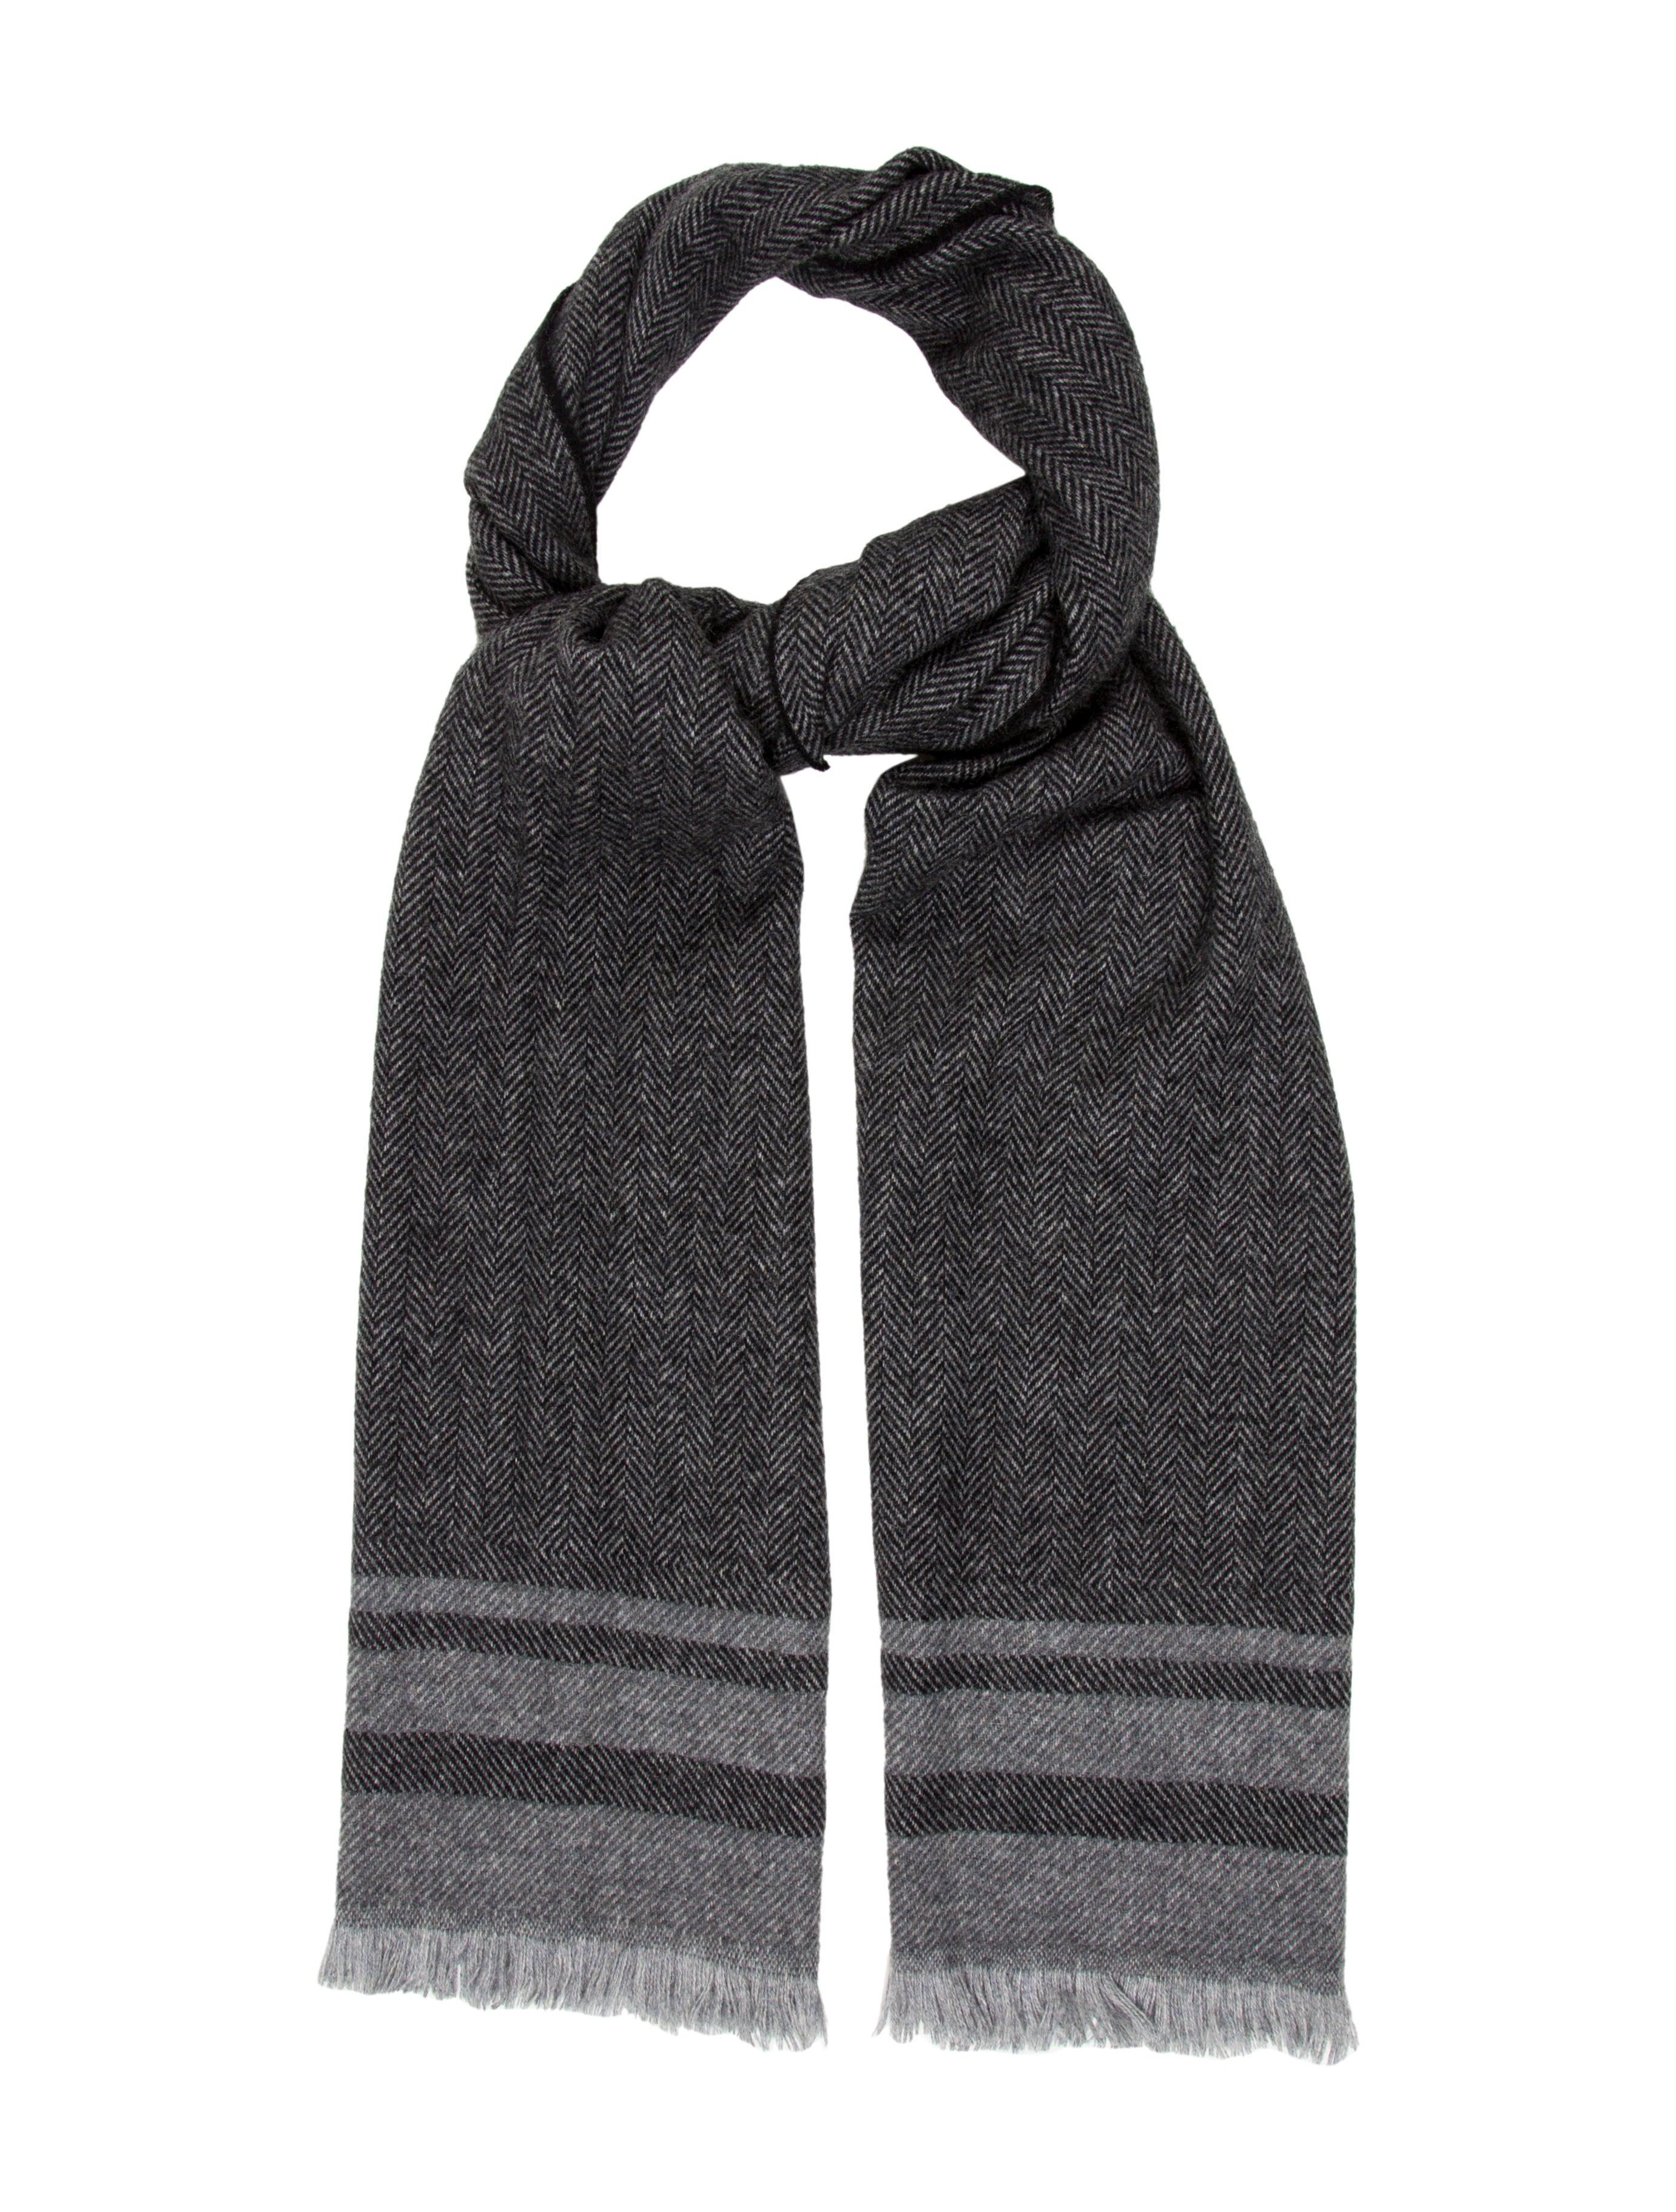 tom ford herringbone scarf w tags accessories